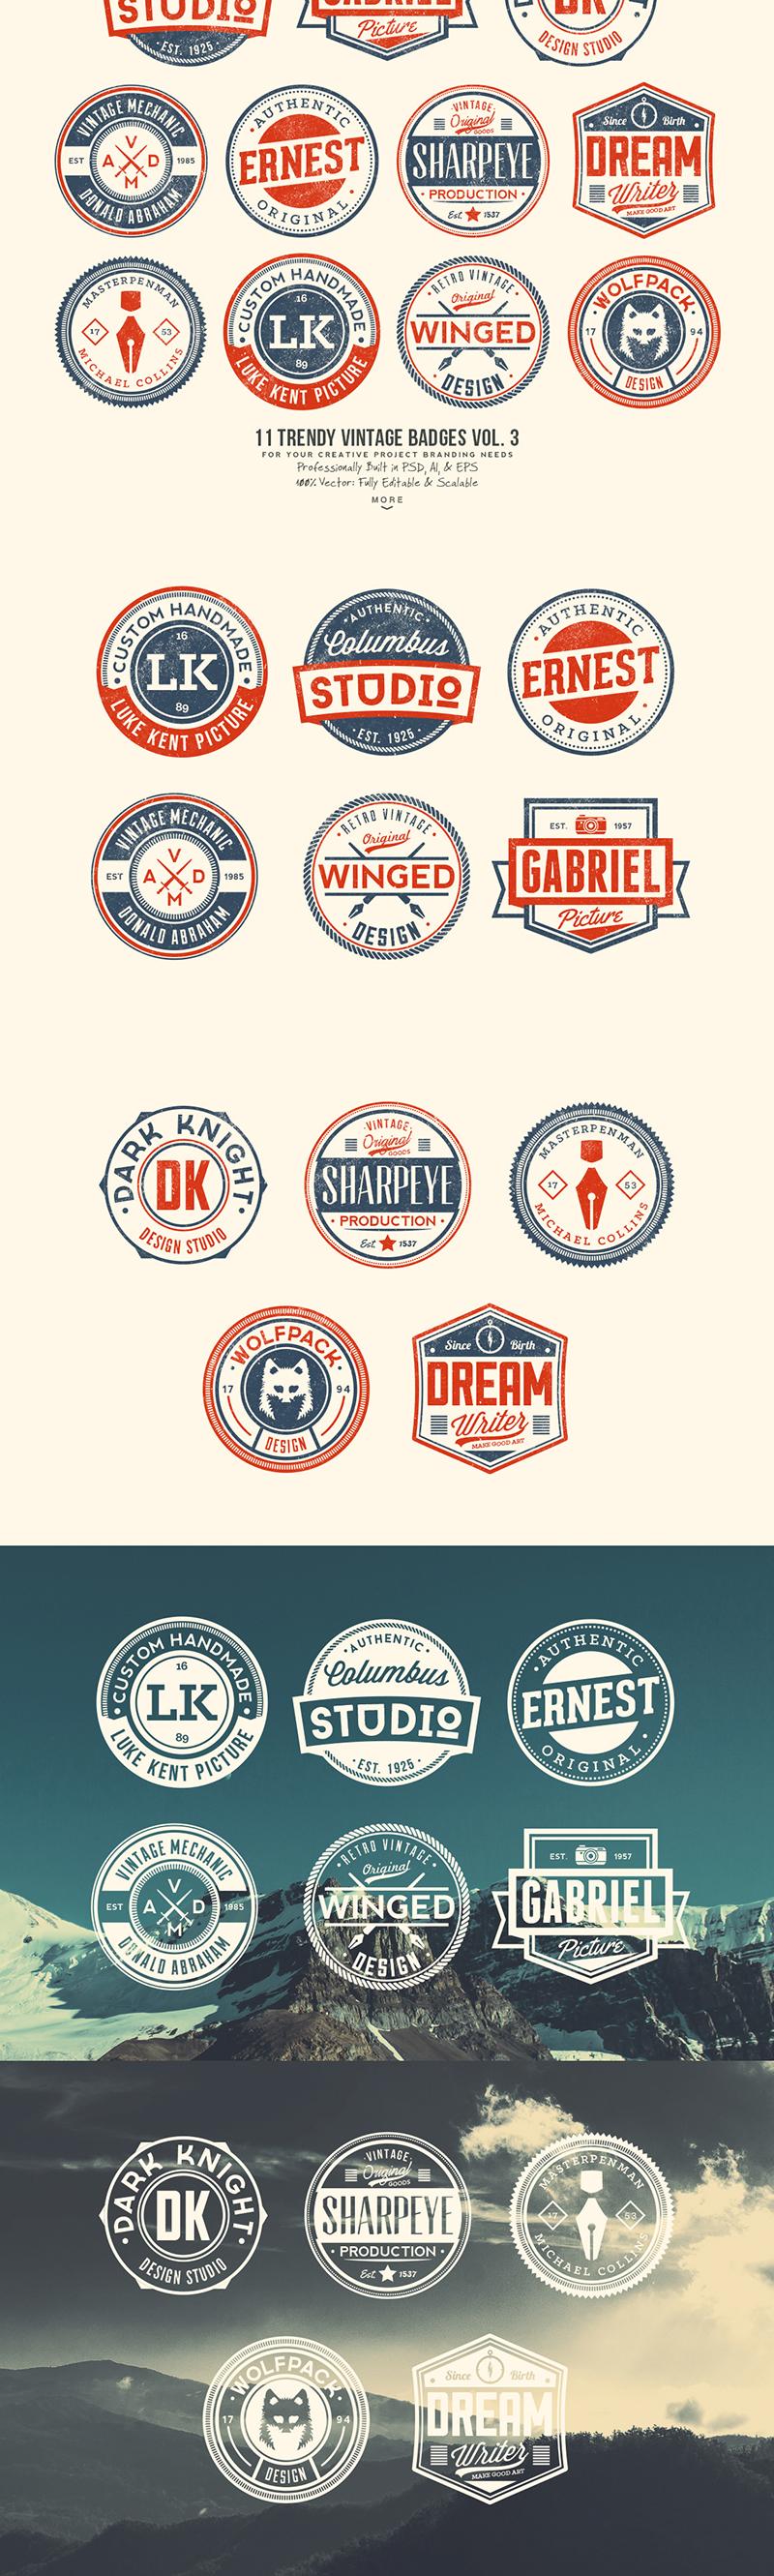 33 Trendy Vintage Badges Bundle Pack Preview 3